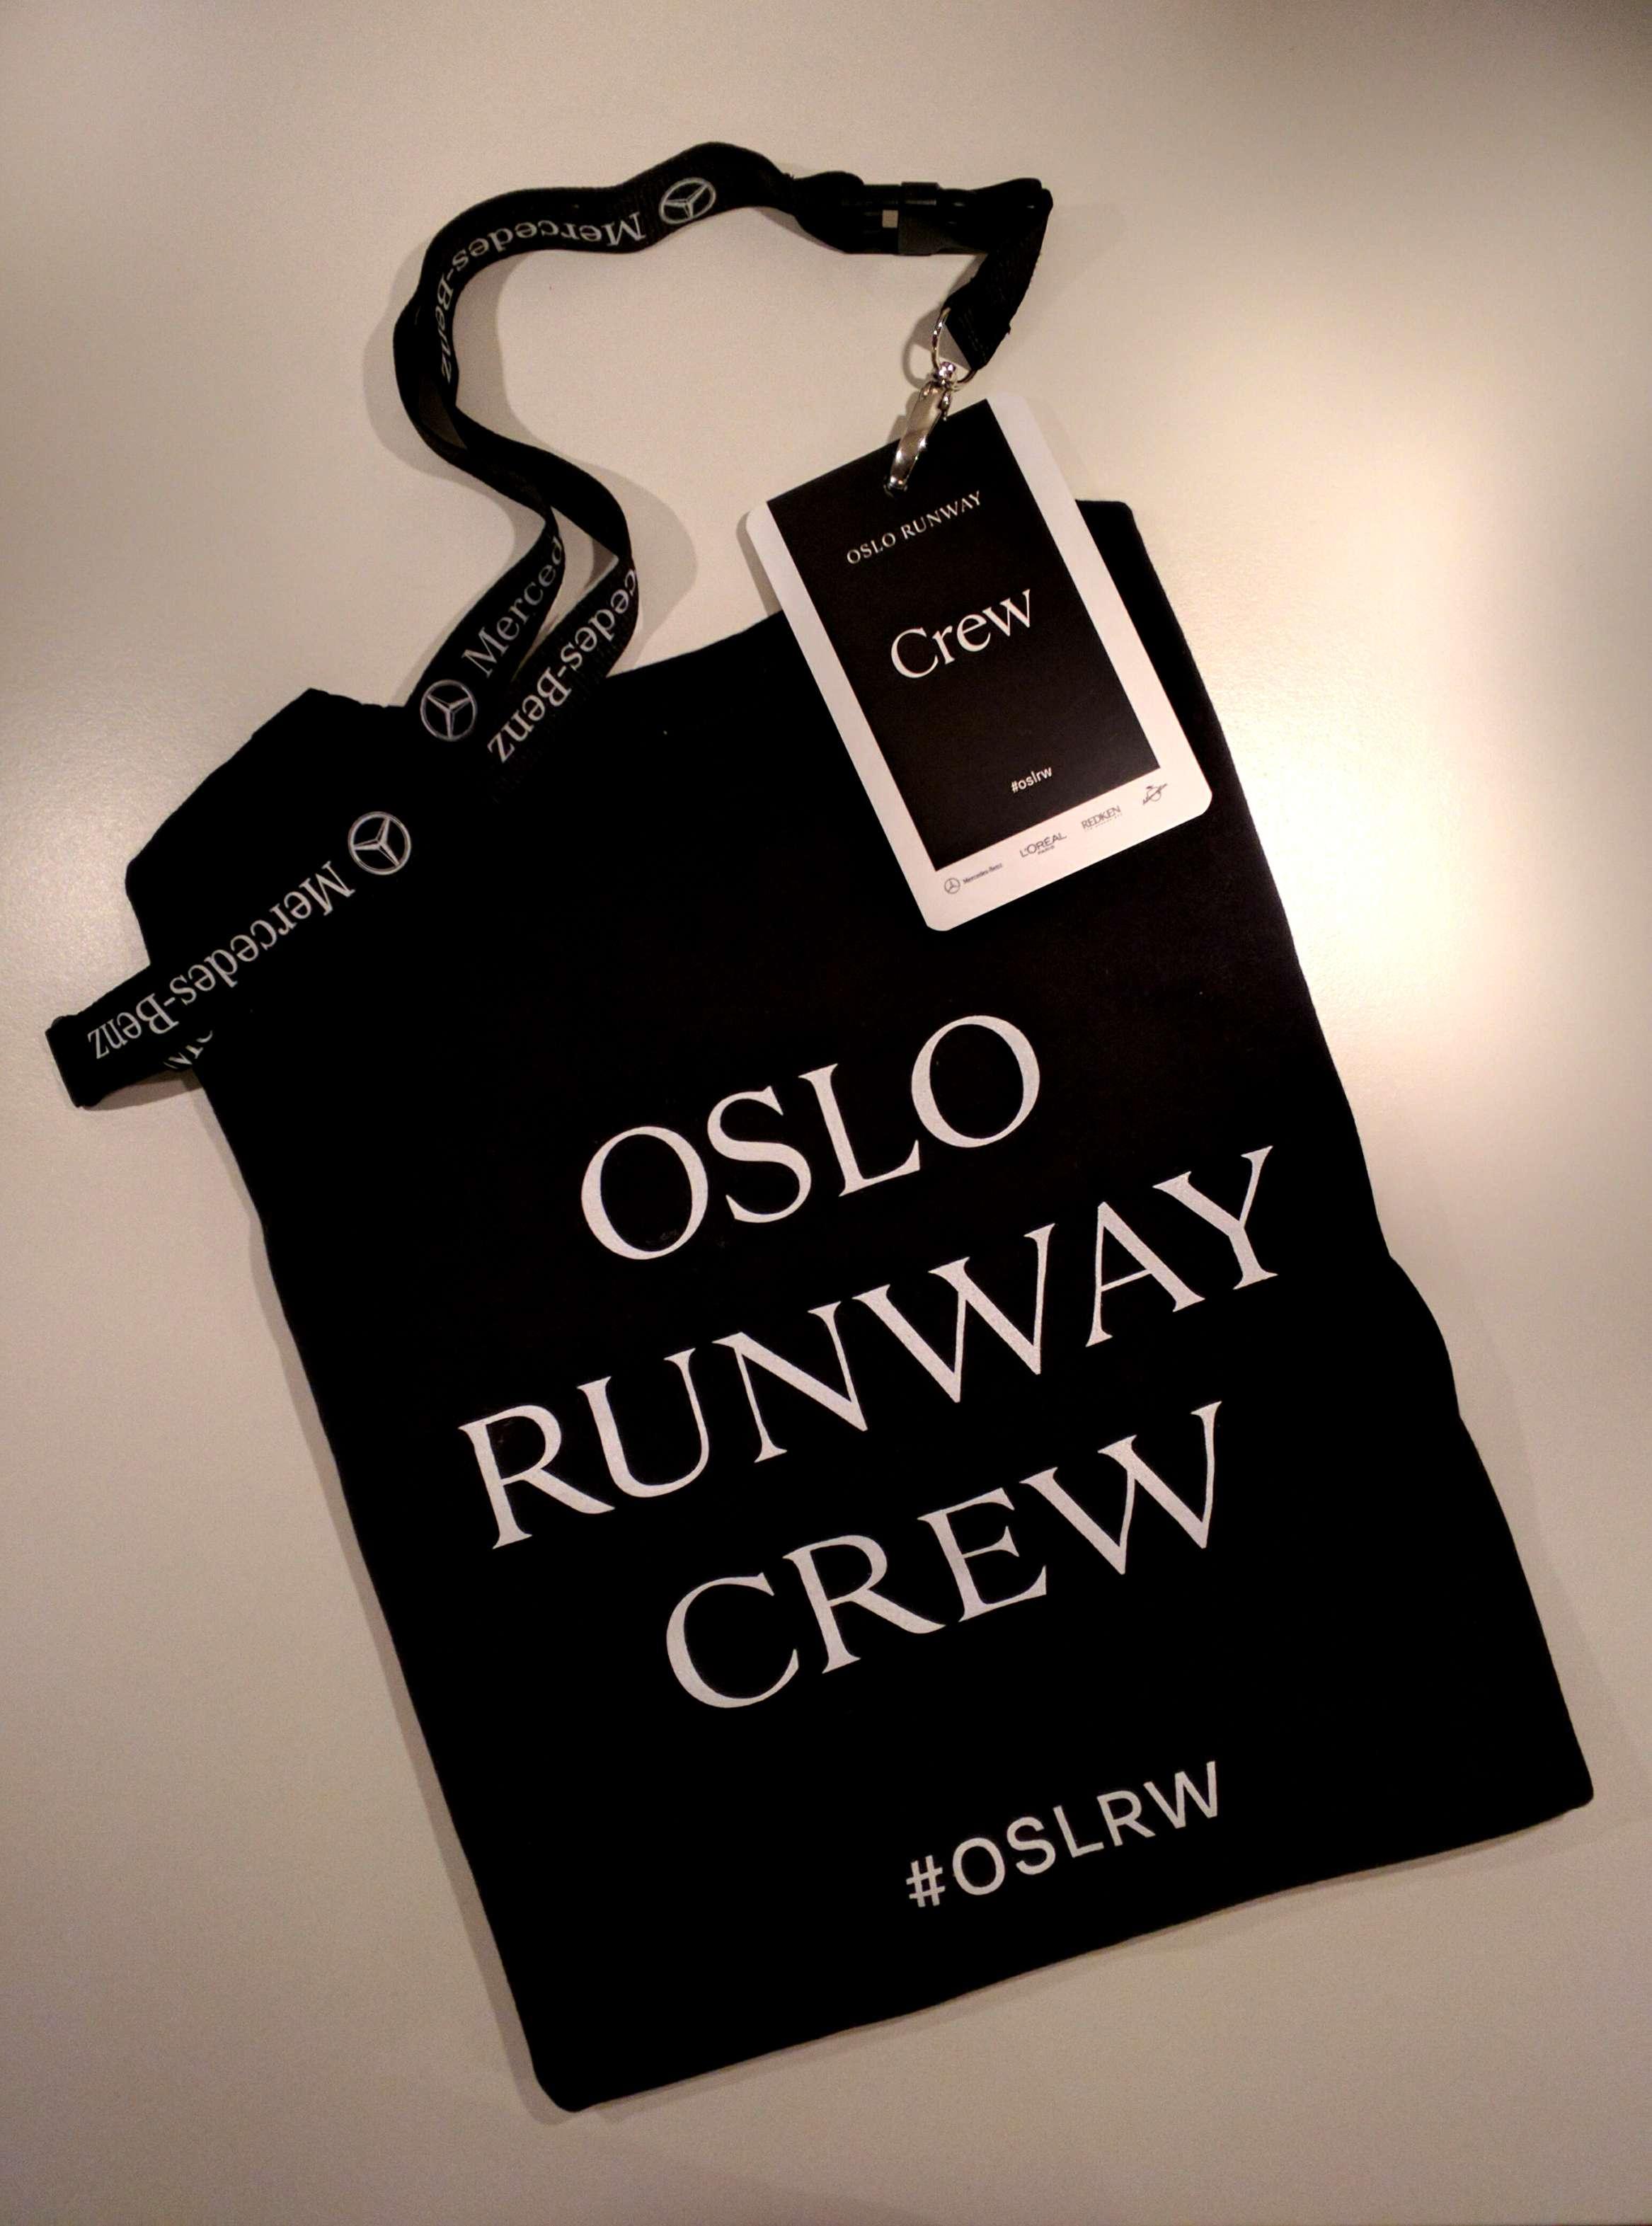 OSLRW crew attire